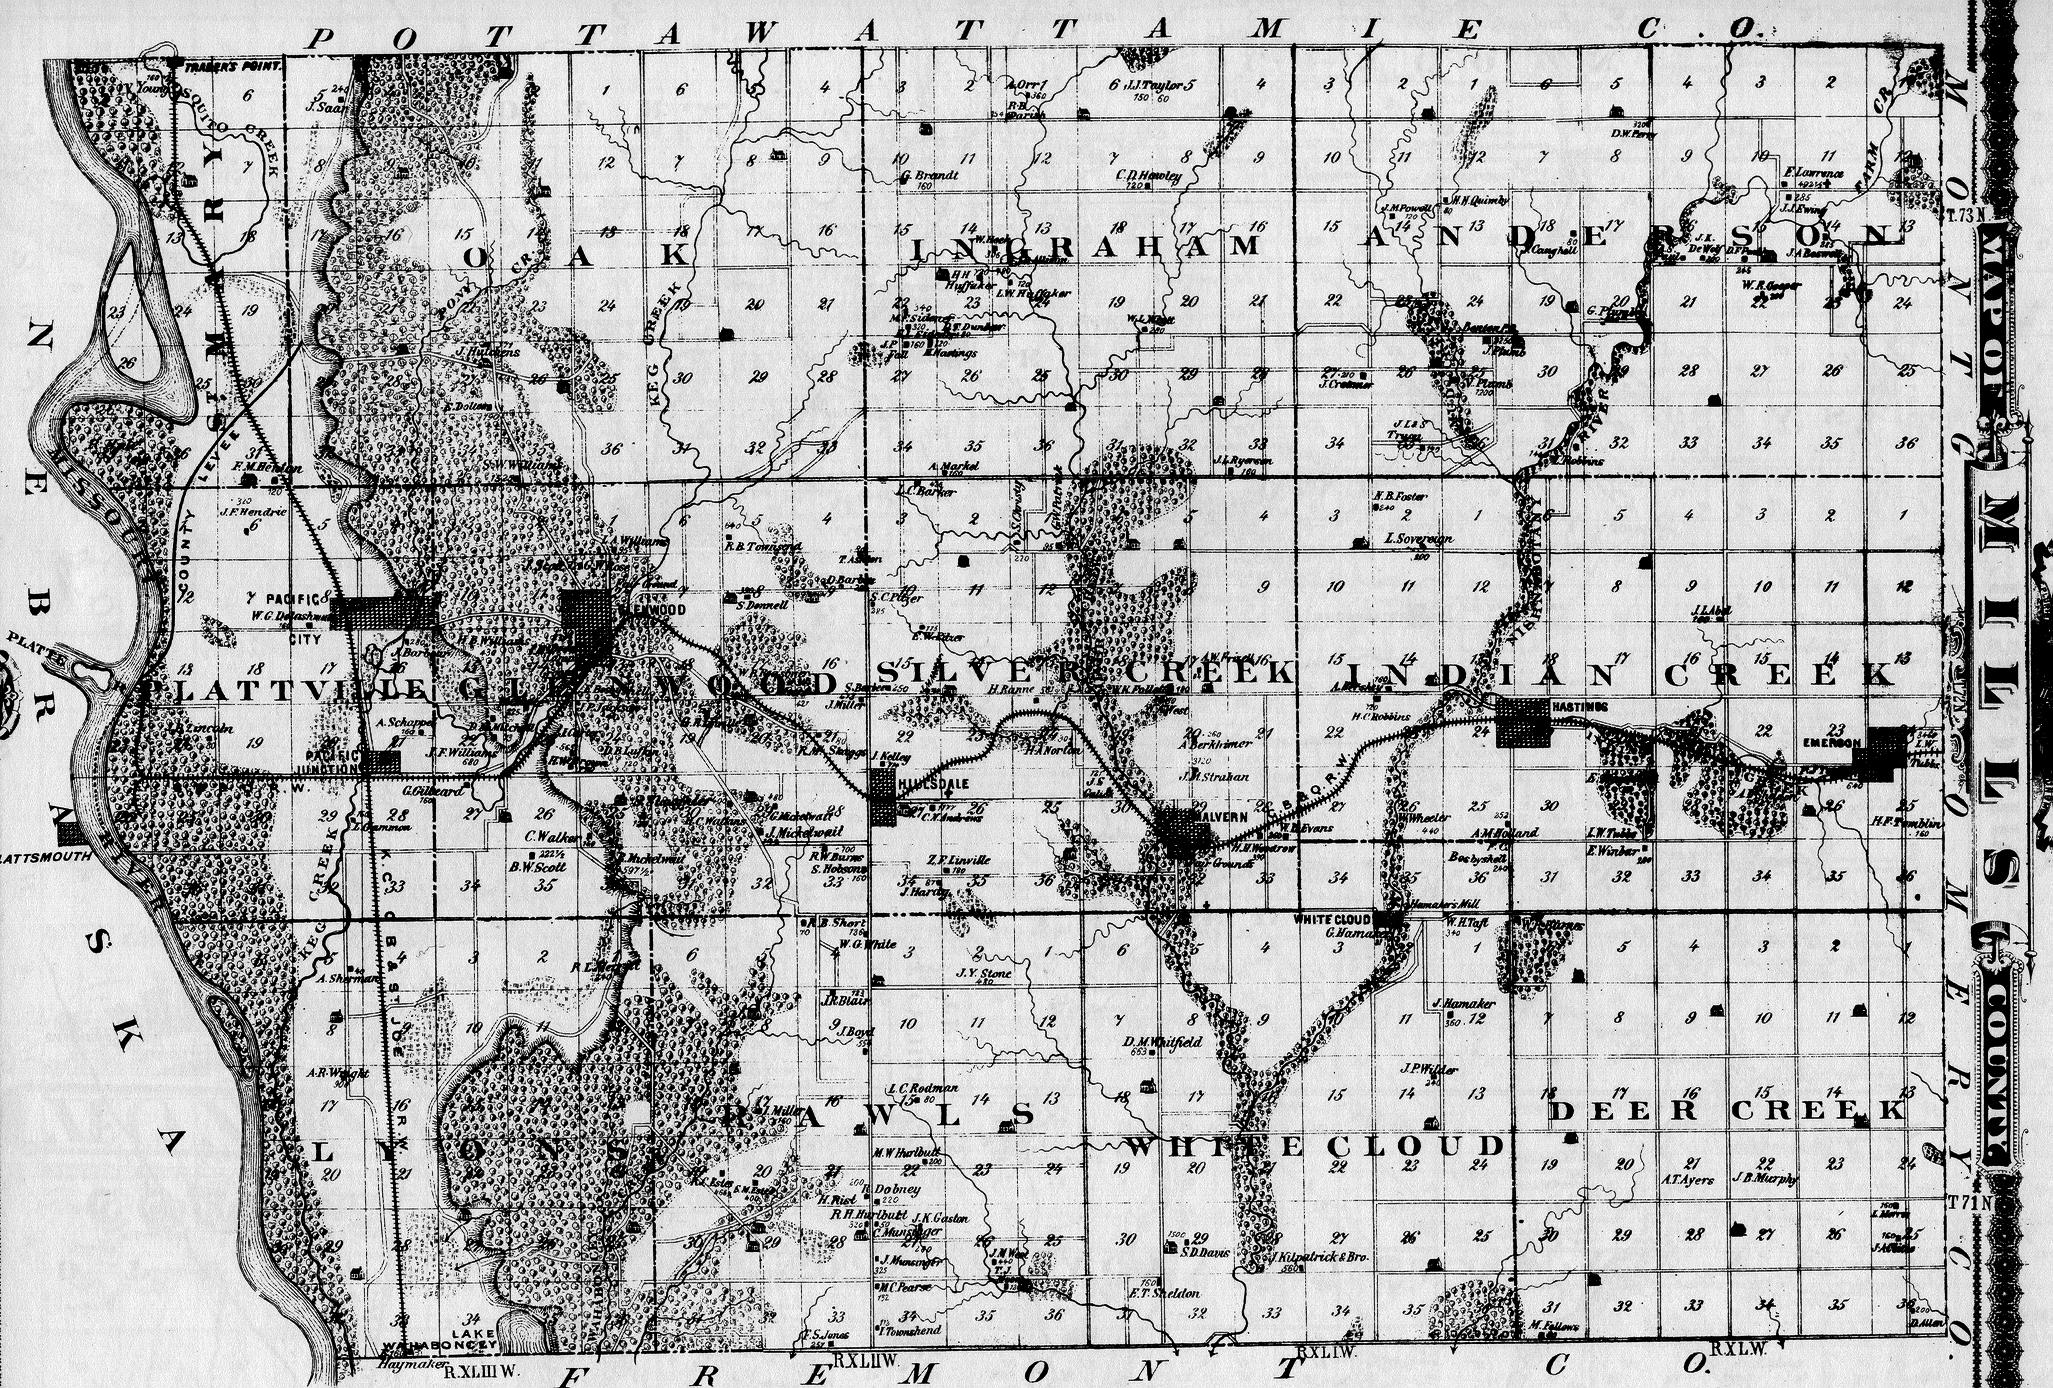 Mills County Iowa Maps And Gazetteers - Iowa maps